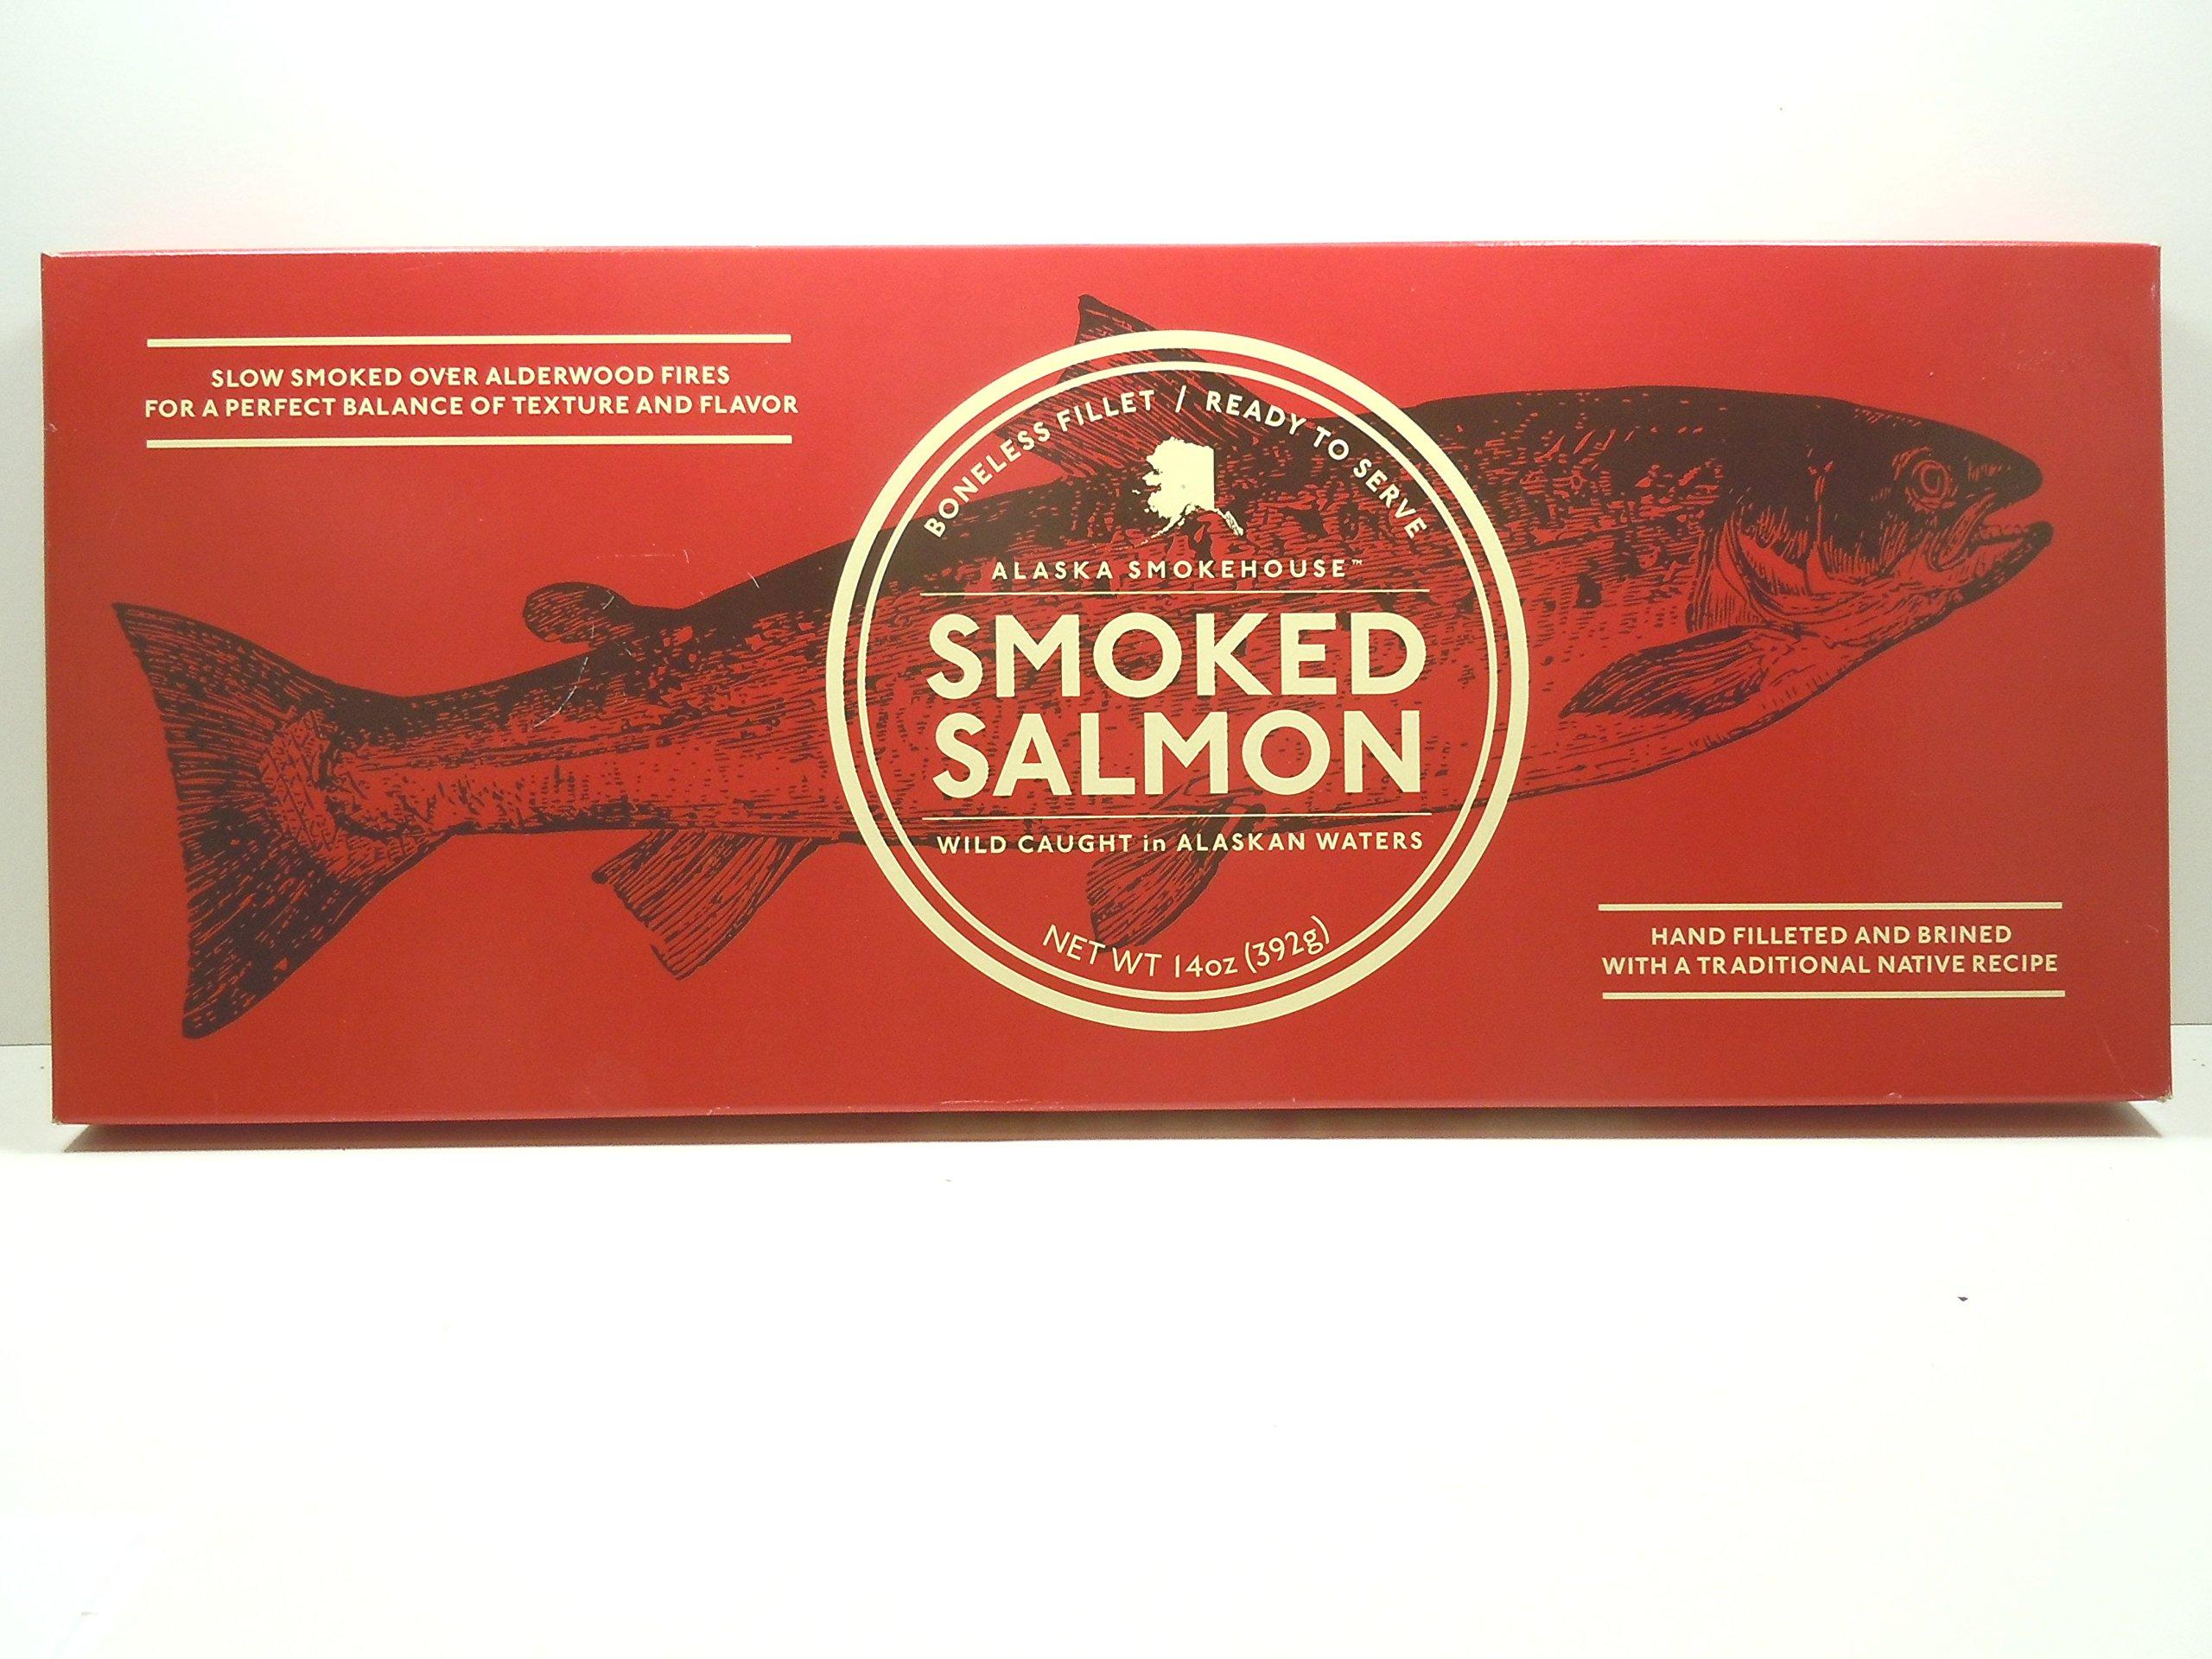 Alaska Seafood Naturally Wild Alaska Smoked Salmon 14oz. Fillet